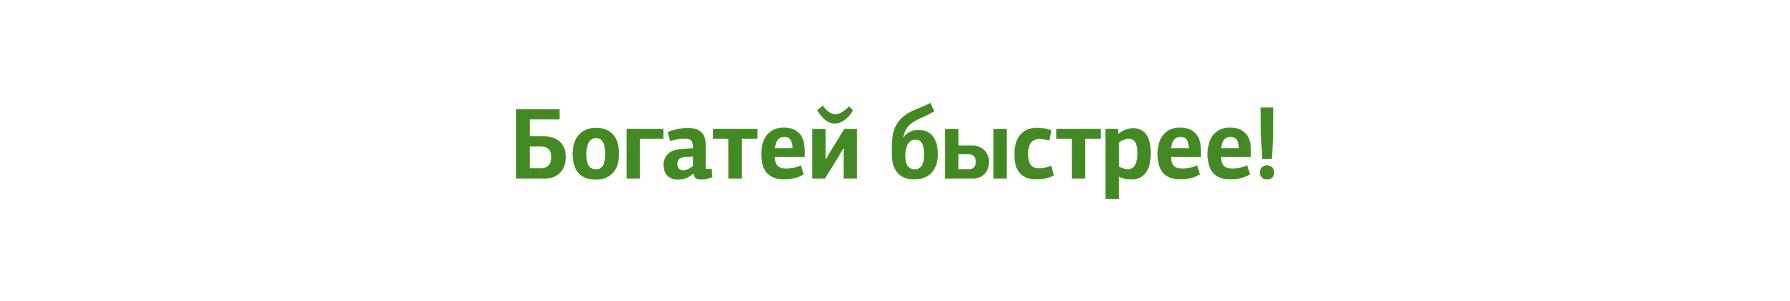 Денис Минеев слоган